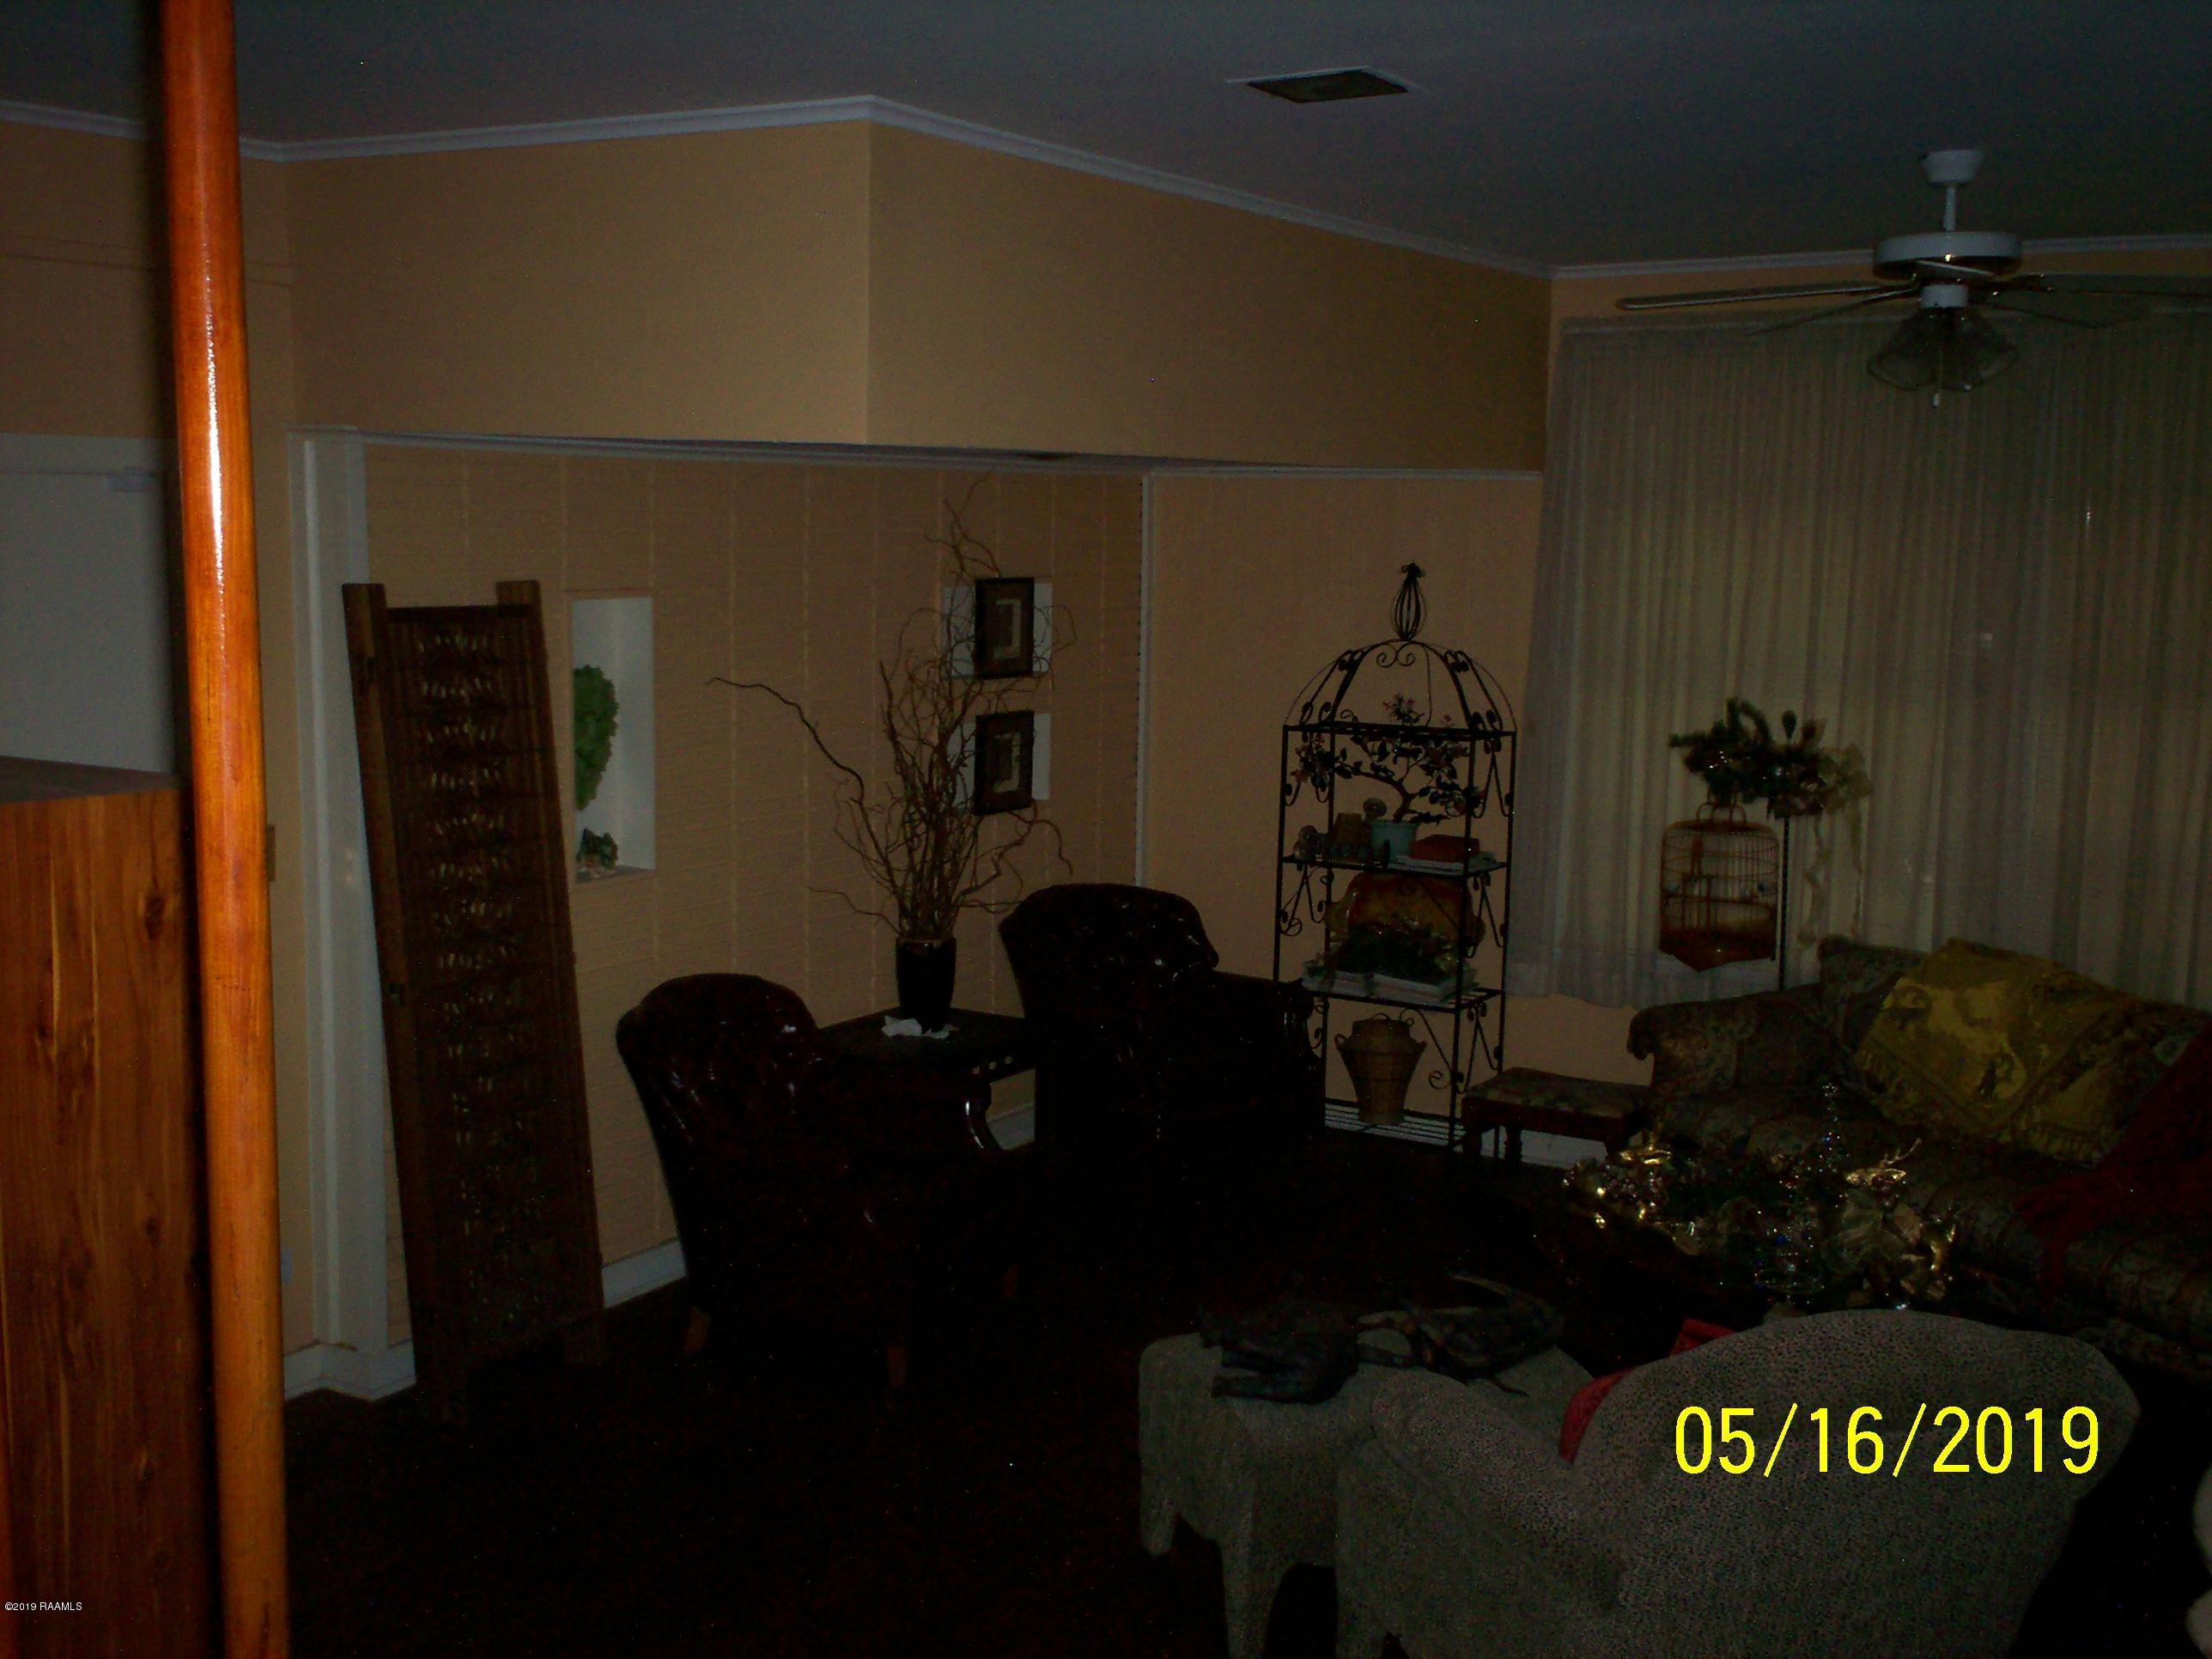 212 Washington Street, St. Martinville, LA 70582 Photo #4